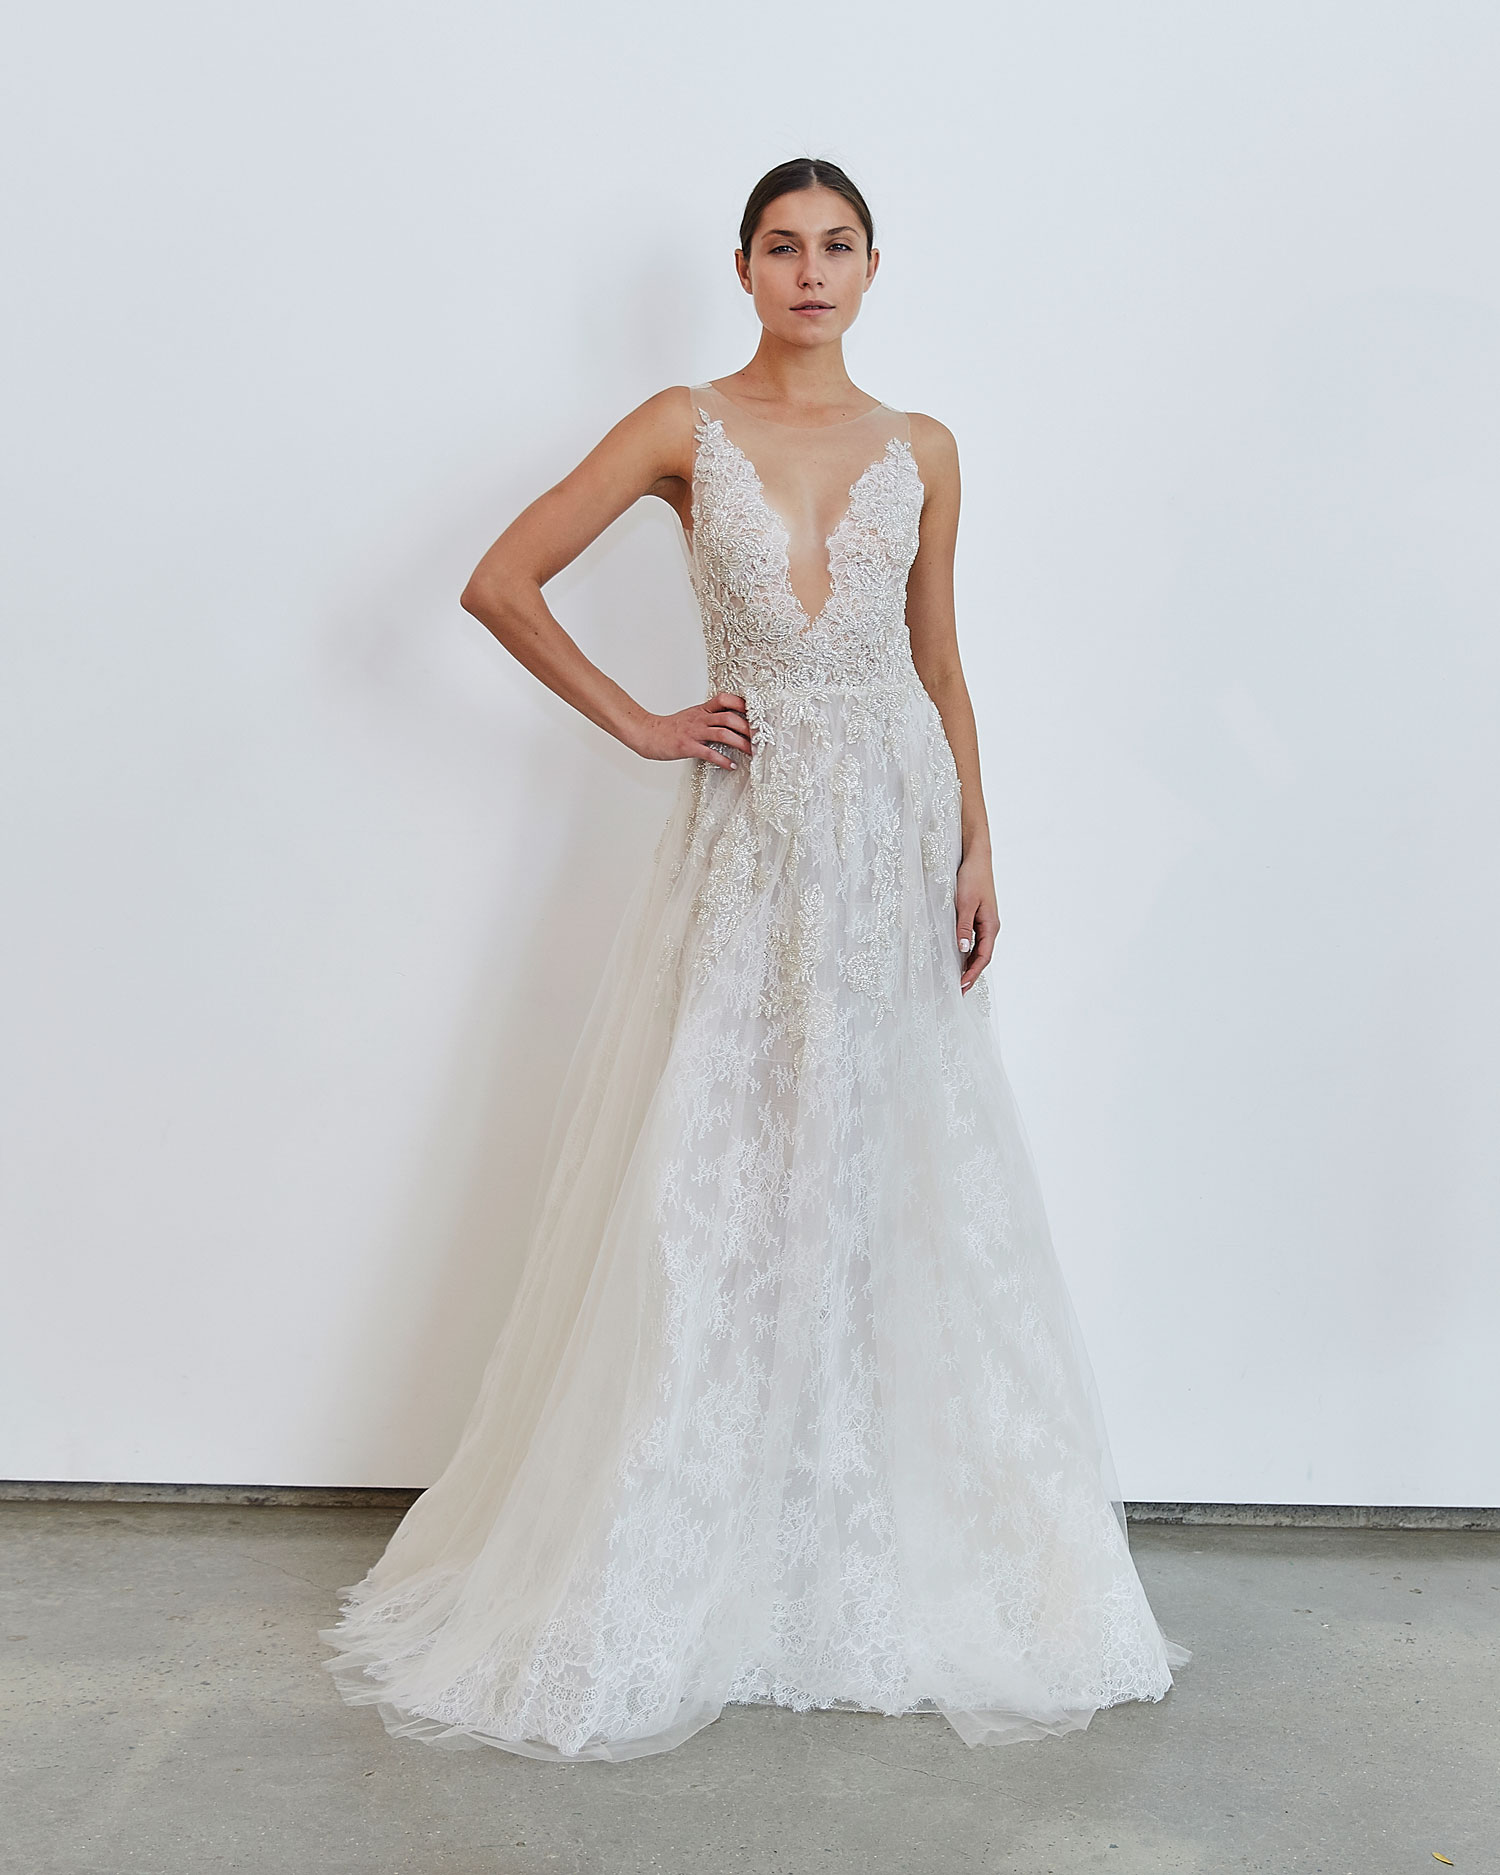 Francesca Miranda Fall 2020 bridal collection Halo wedding dress illusion neckline